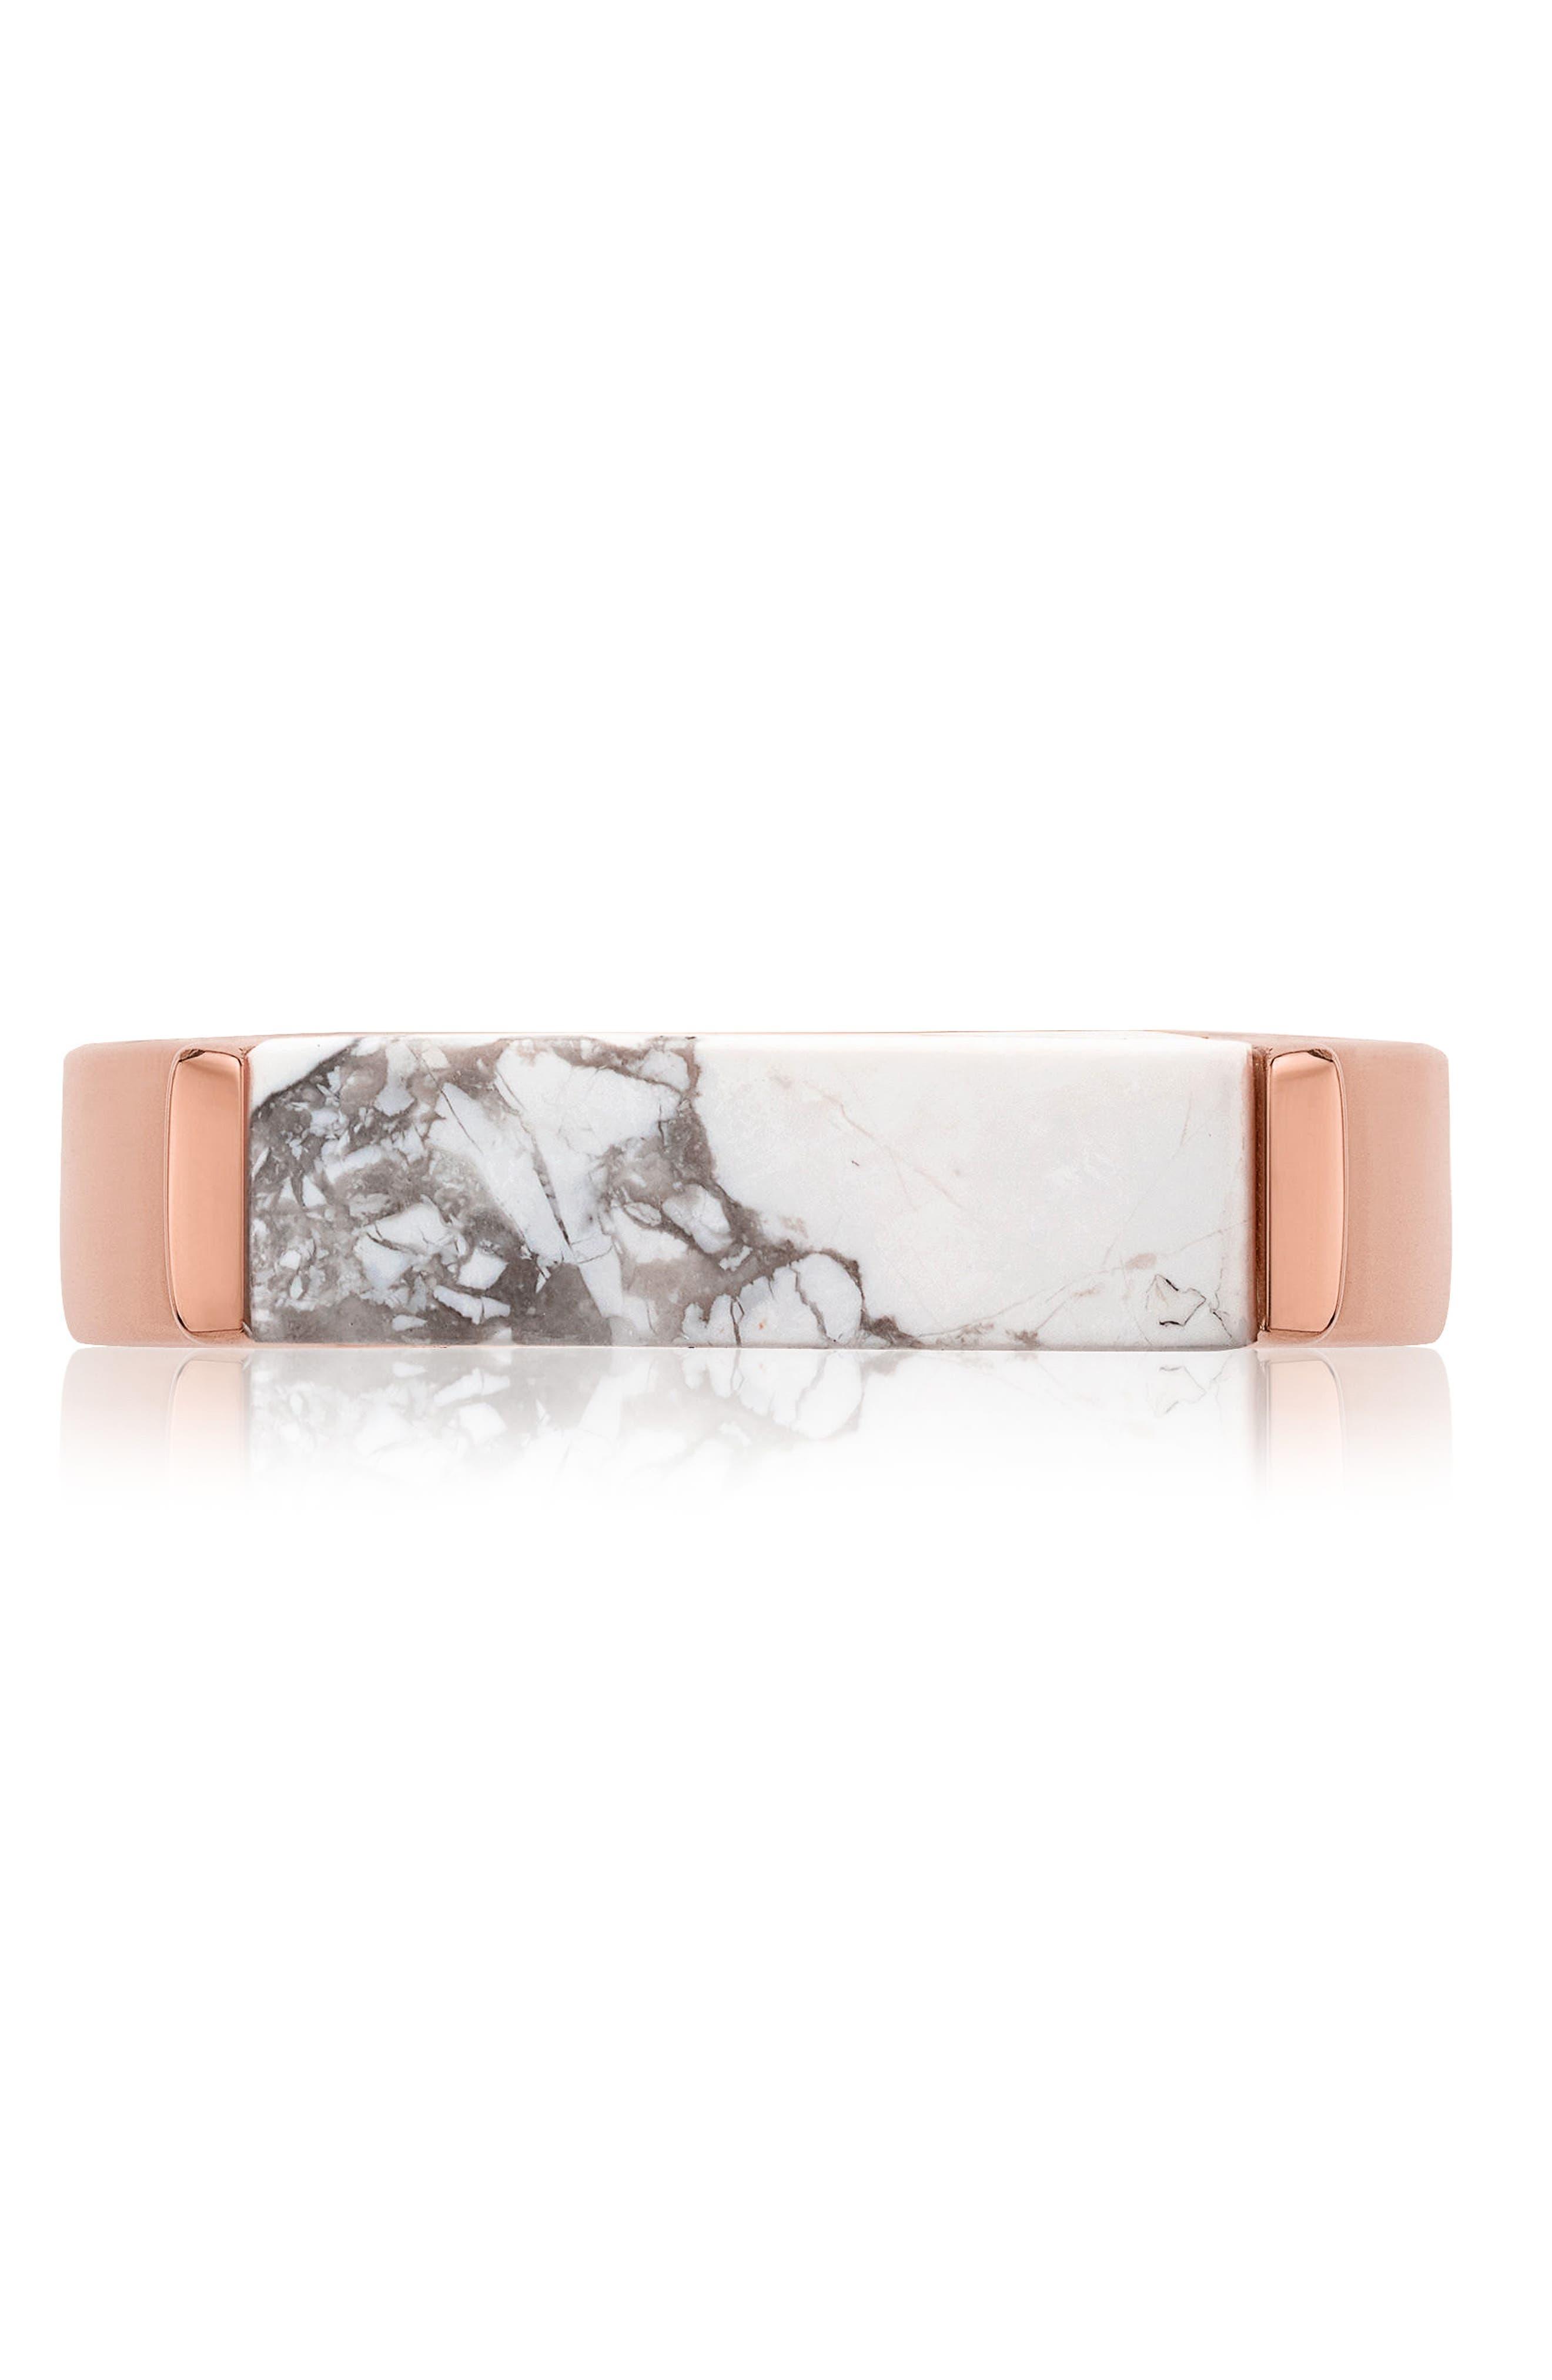 Engravable Linear Stone Ring,                             Alternate thumbnail 3, color,                             ROSE GOLD/ HOWLITE